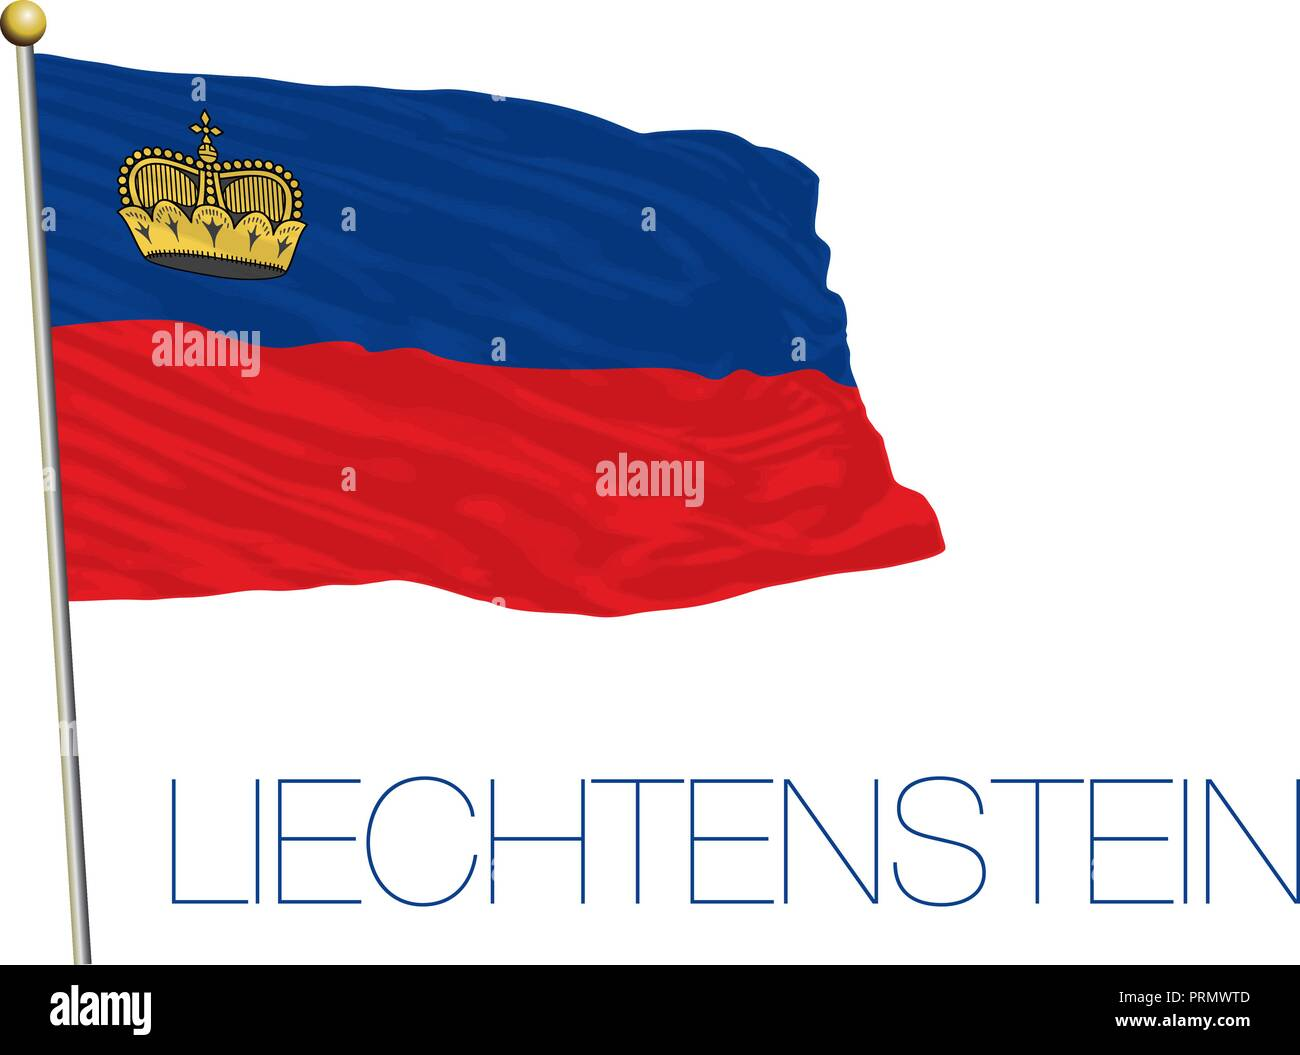 Liechtenstein official flag, vector illustration Stock Vector